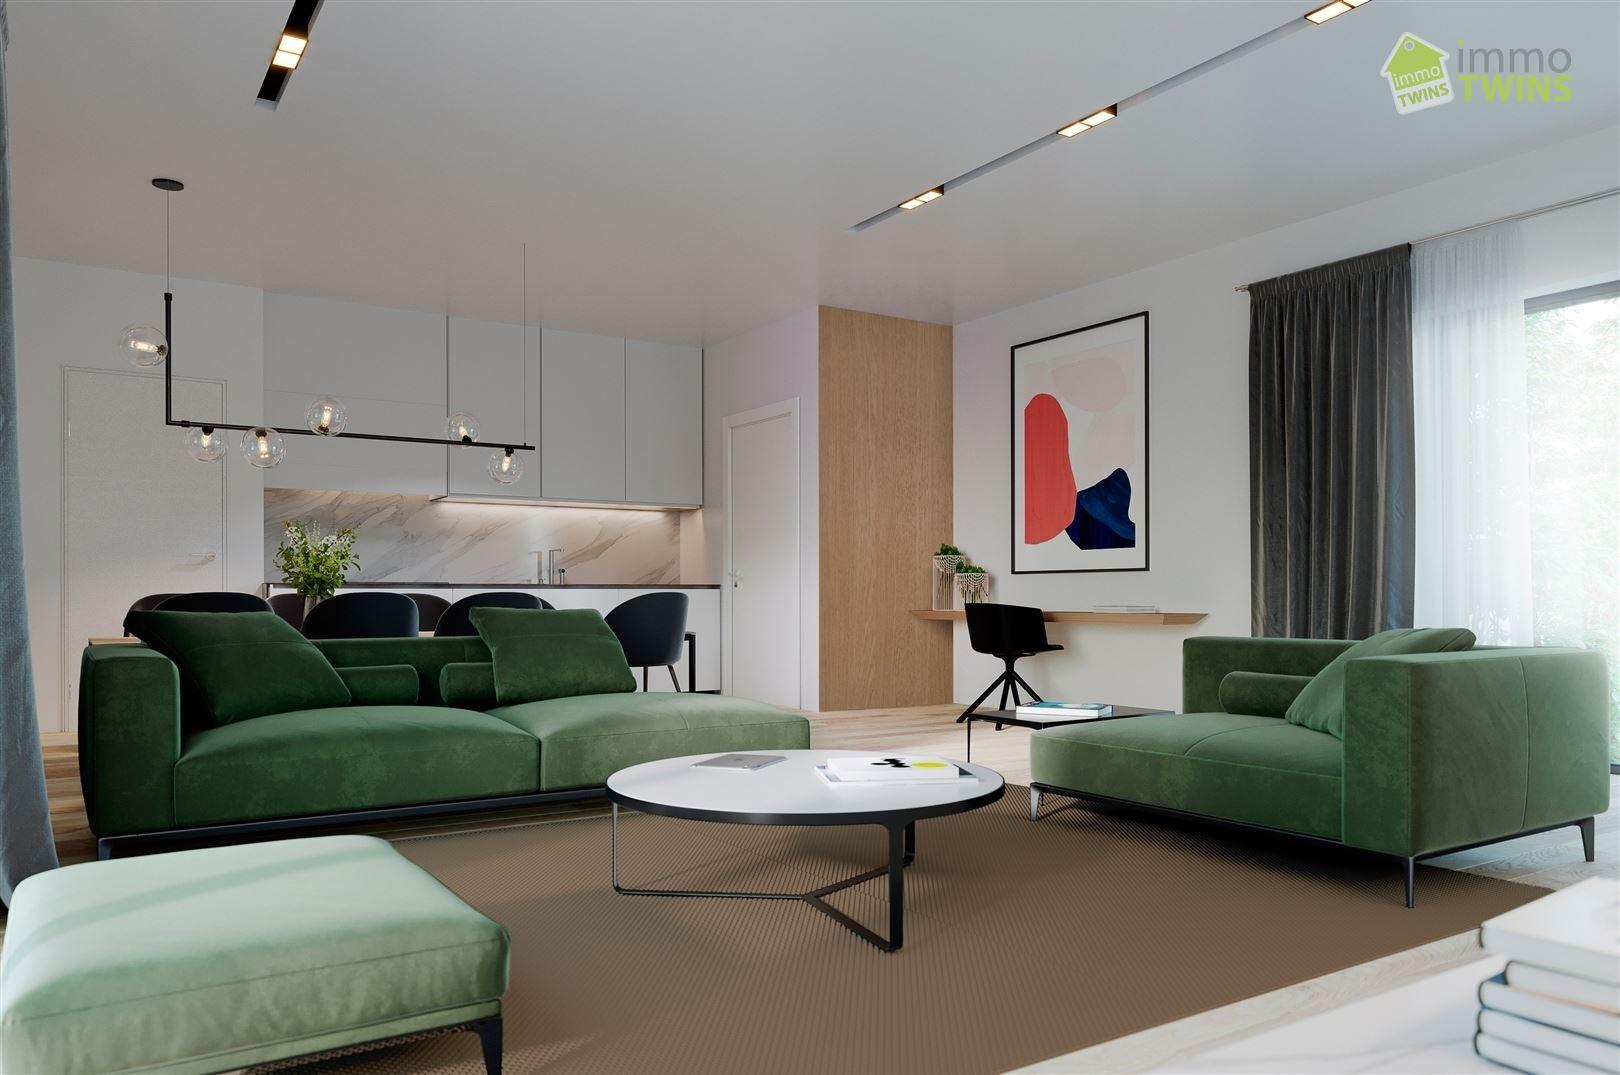 Foto 6 : Penthouse te 9220 MOERZEKE (België) - Prijs € 183.000